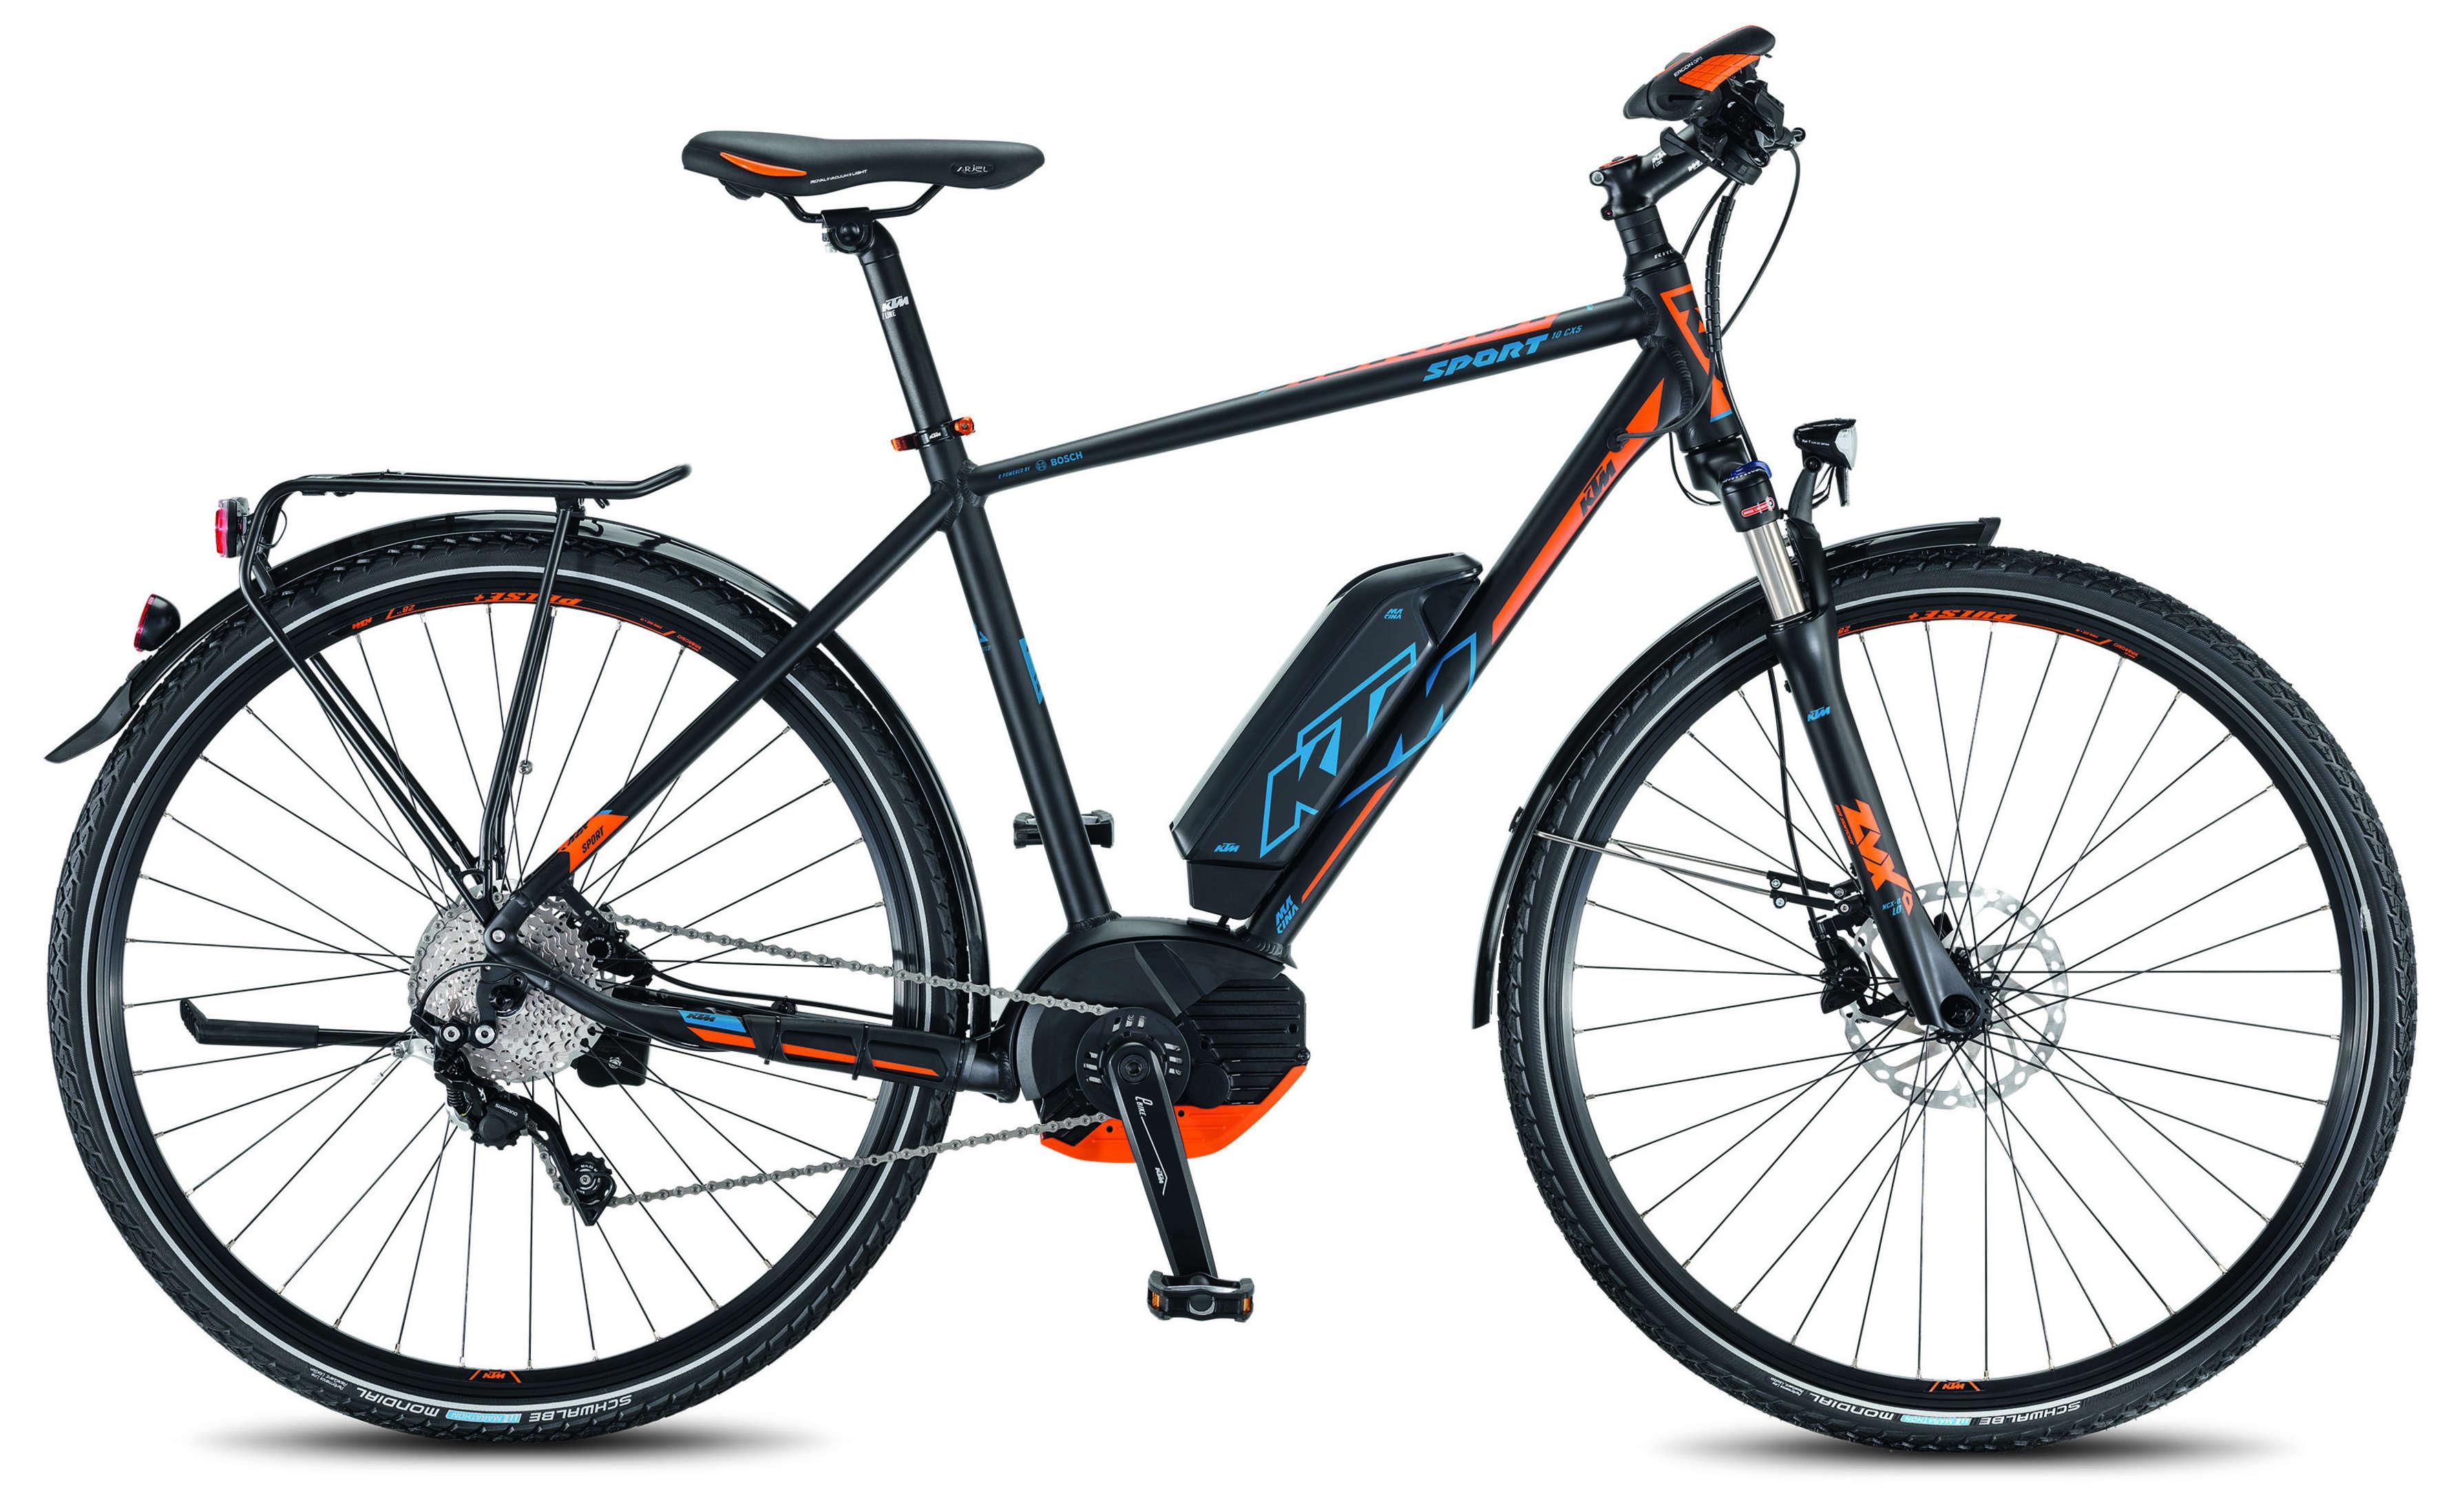 ktm e bike macina sport 10 cx5 eurorad bikeleasingeurorad bikeleasing. Black Bedroom Furniture Sets. Home Design Ideas